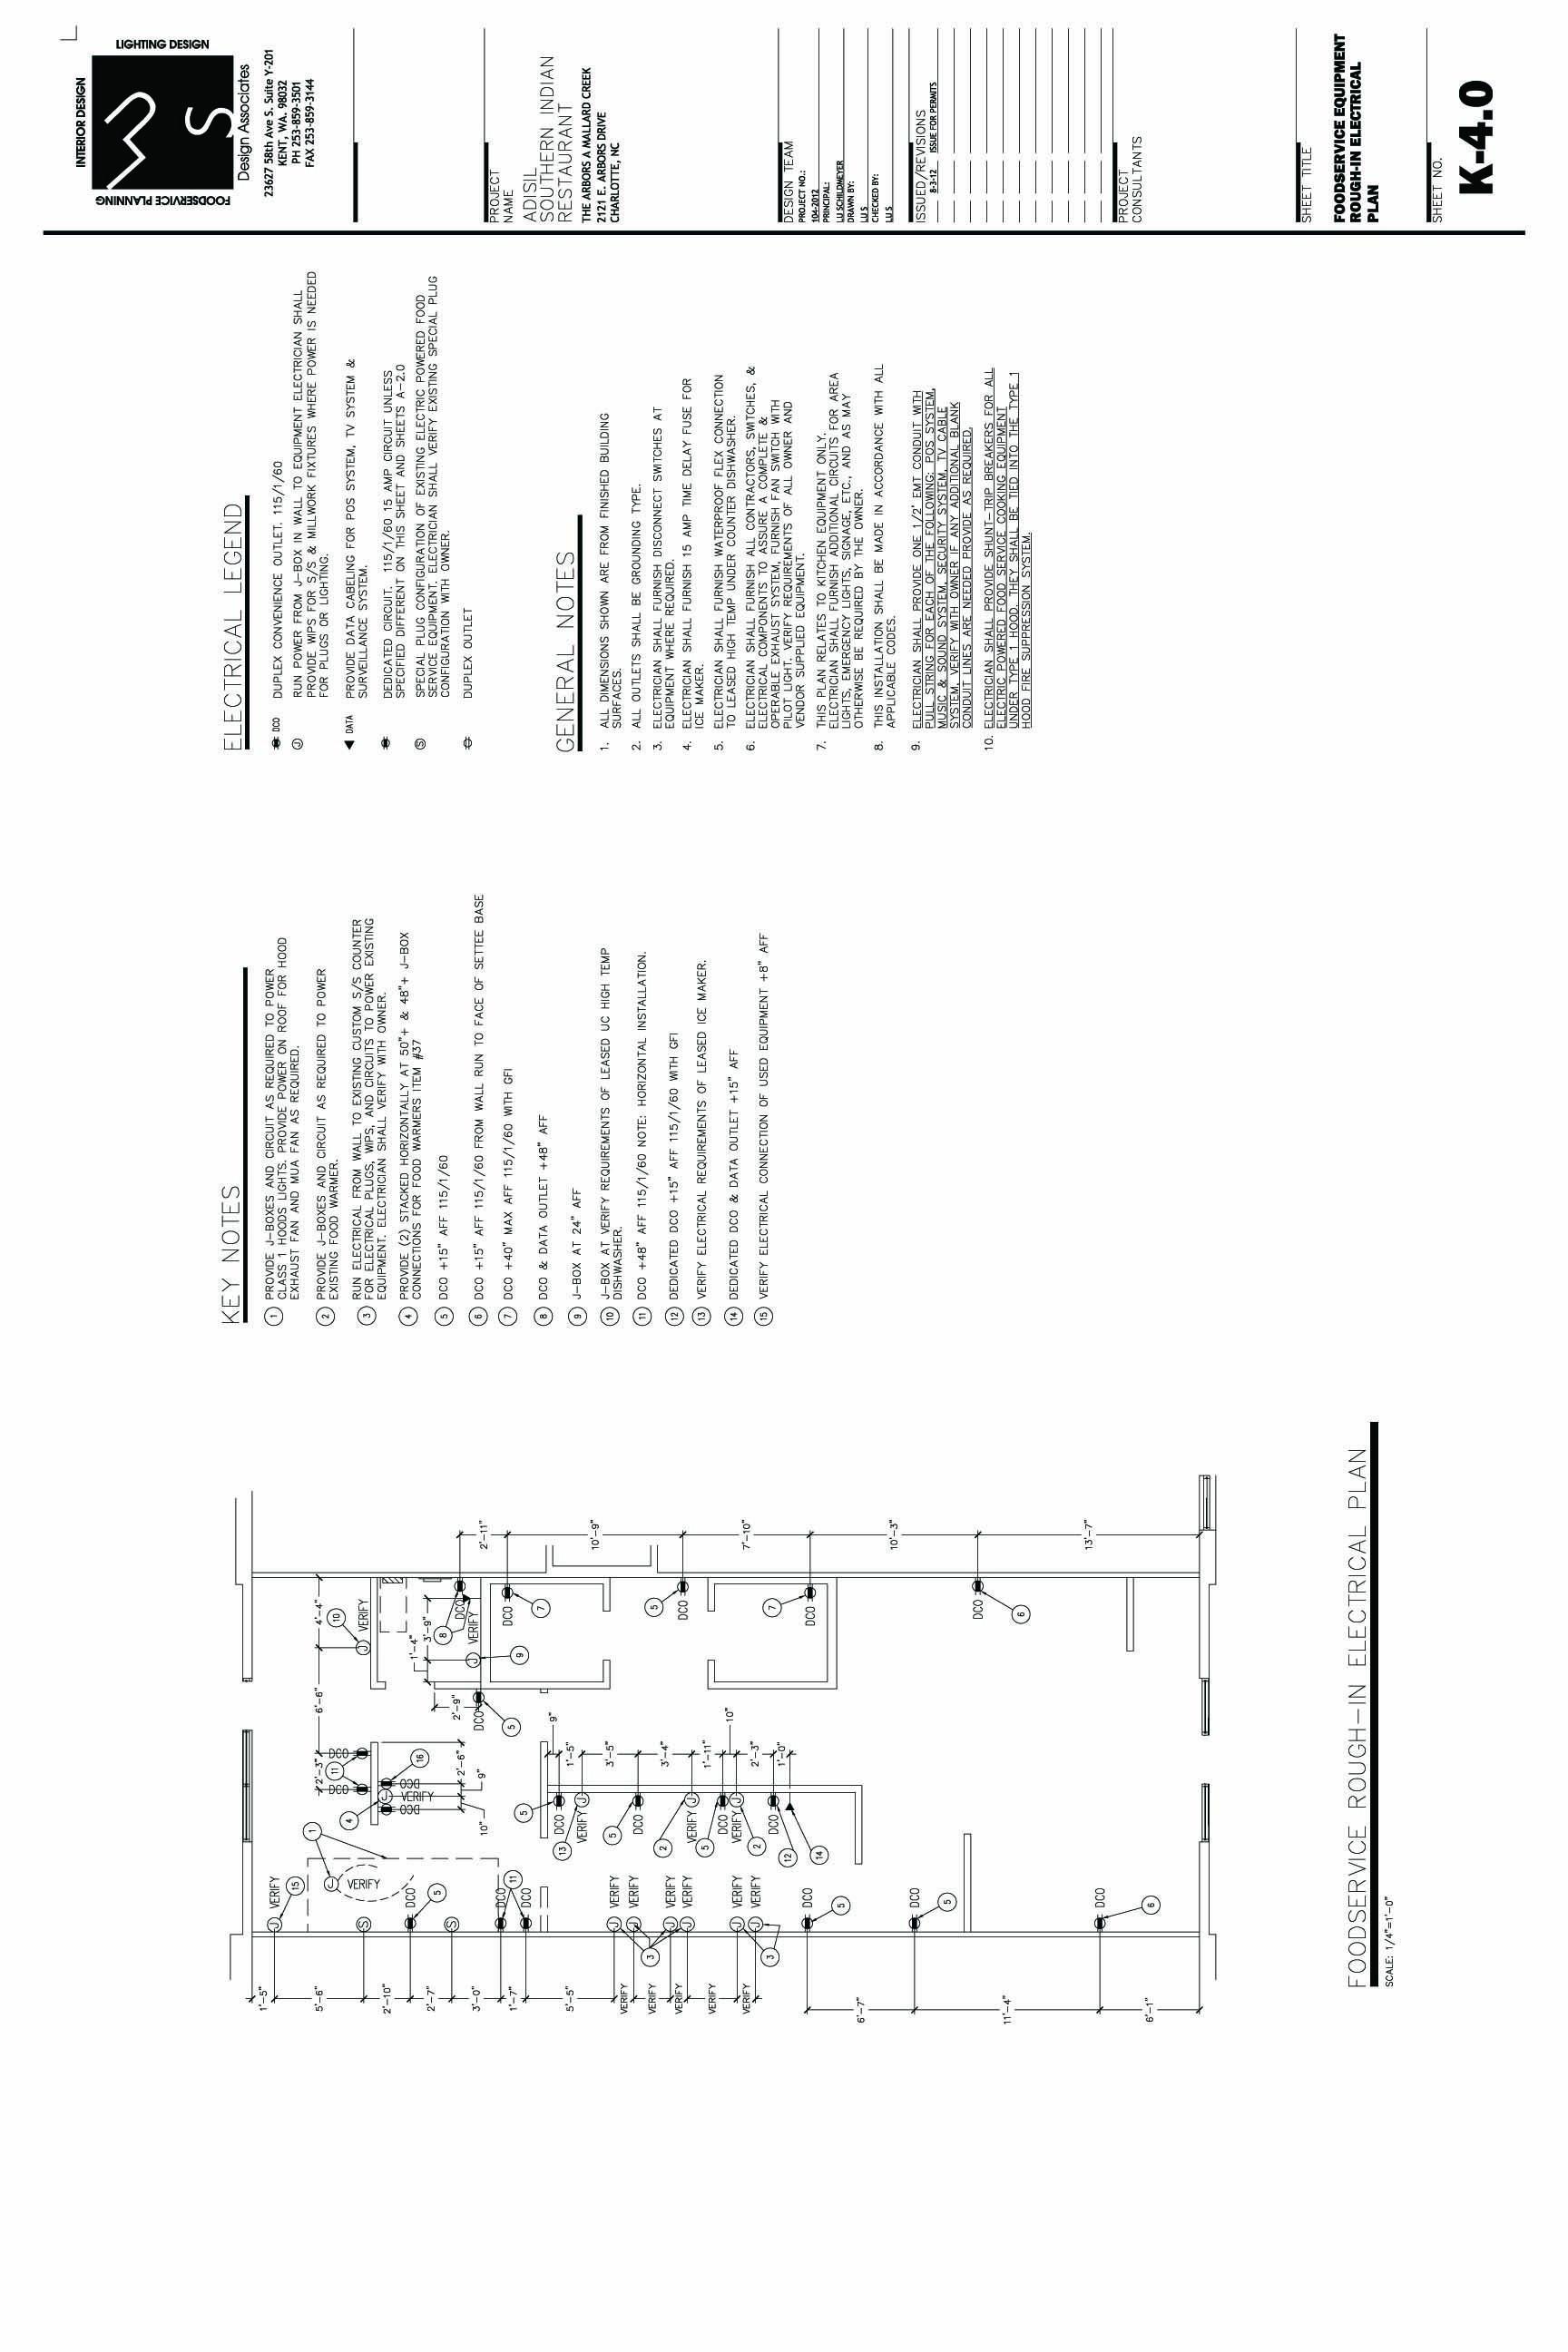 adasil cd rough in electrical plan designed by lu s design associates [ 1728 x 2592 Pixel ]